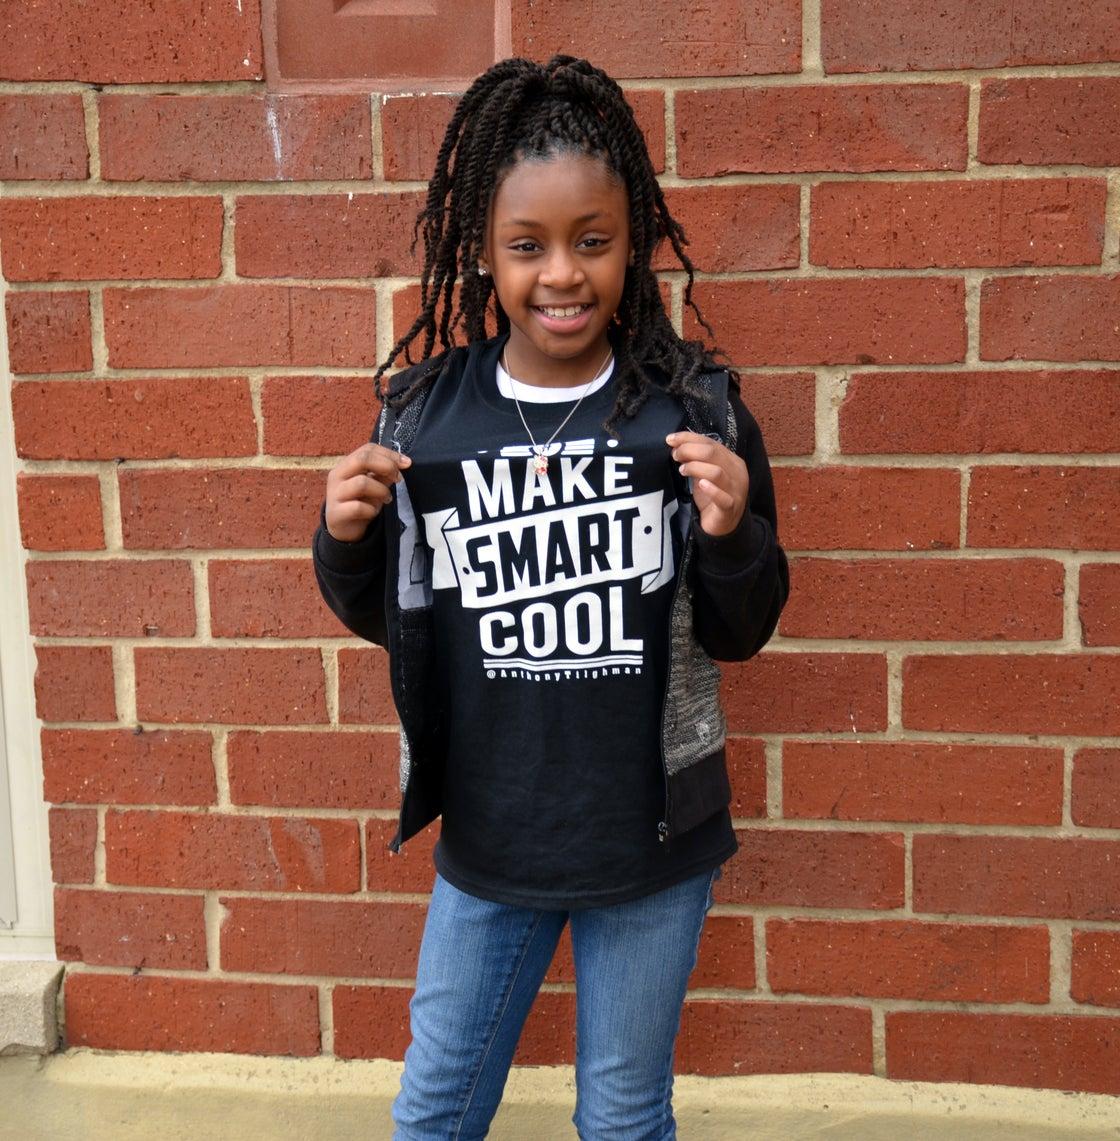 Image of MakeSmartCool Kids Youth Tee